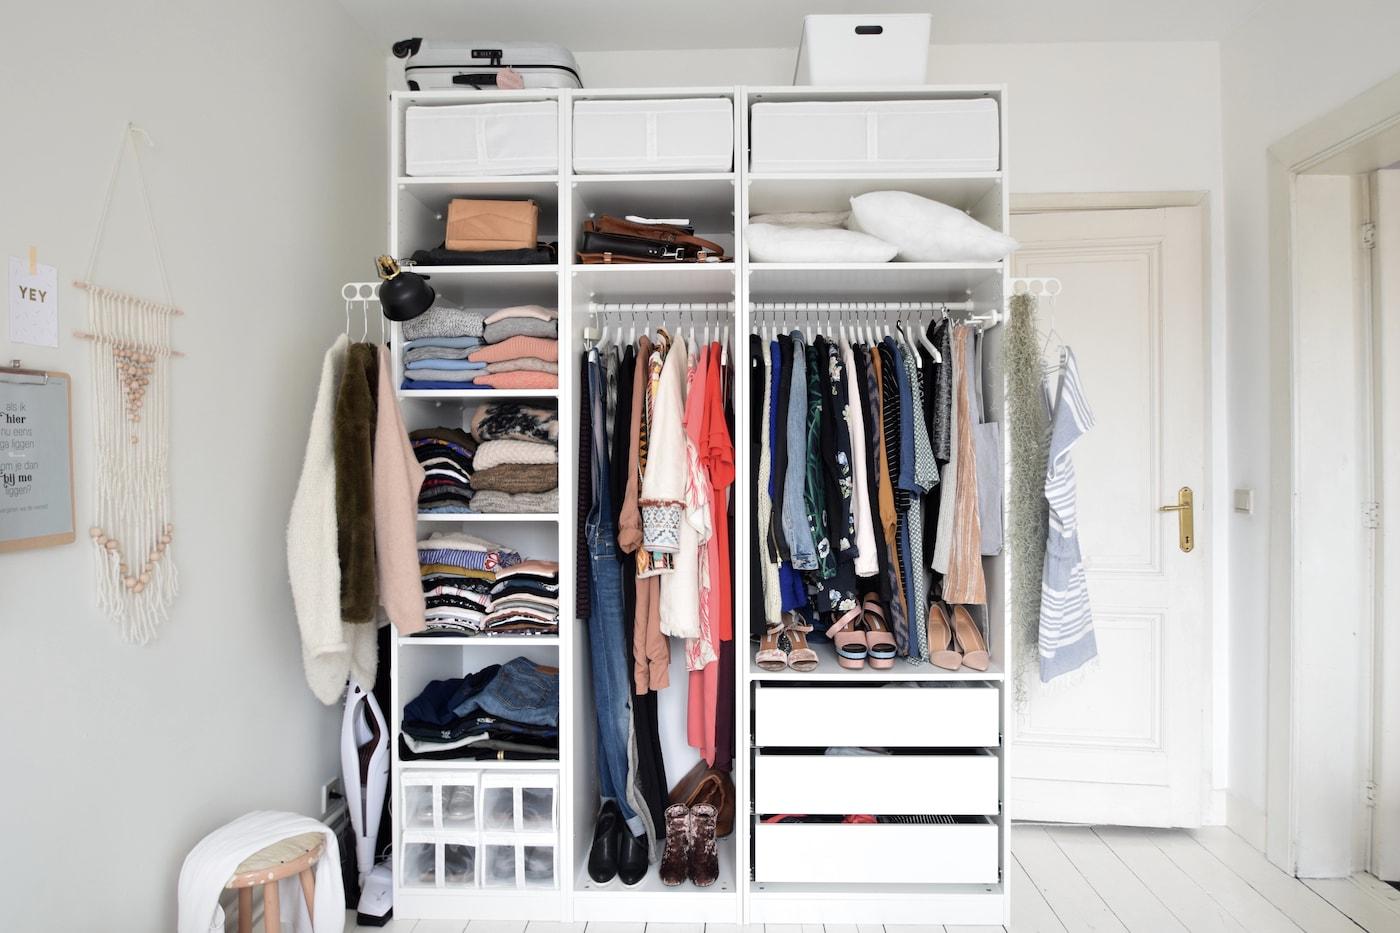 Robe Garde Pour 8pnowk0 Une Ouverte Ikea Conseils BhrtCQdsx